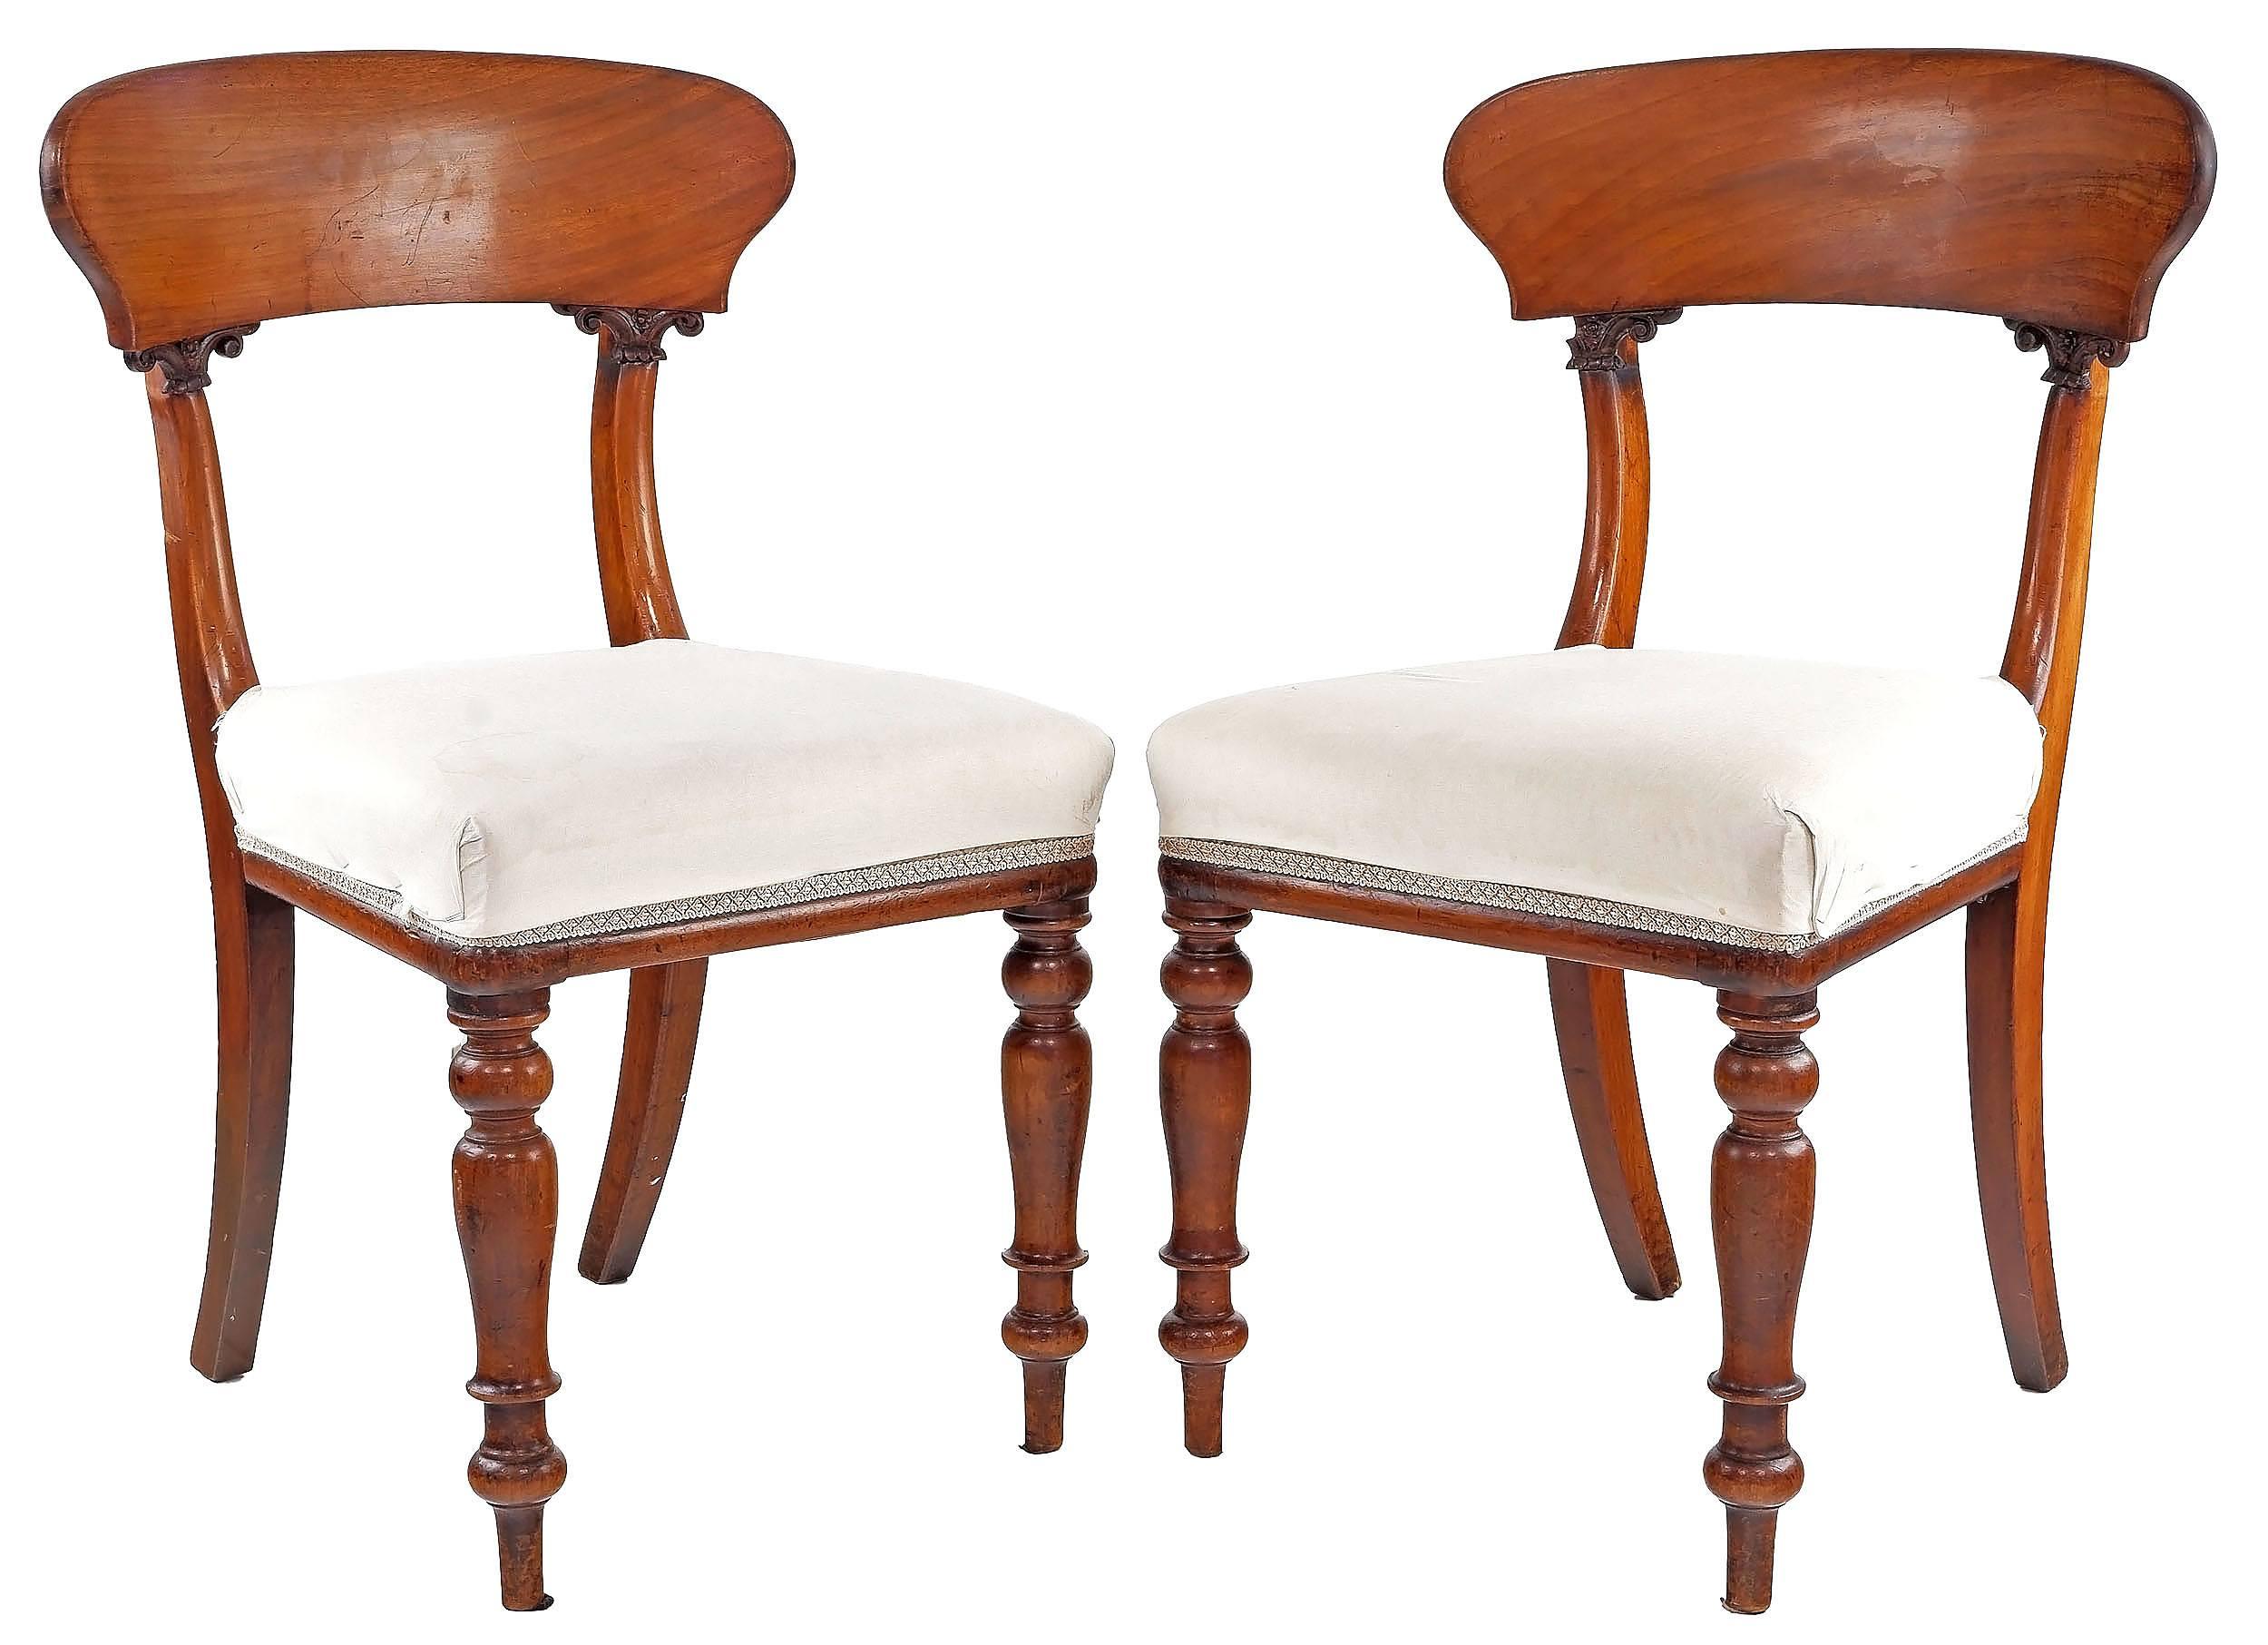 'Set of Six William IV Mahogany Dining Chairs Circa 1835'